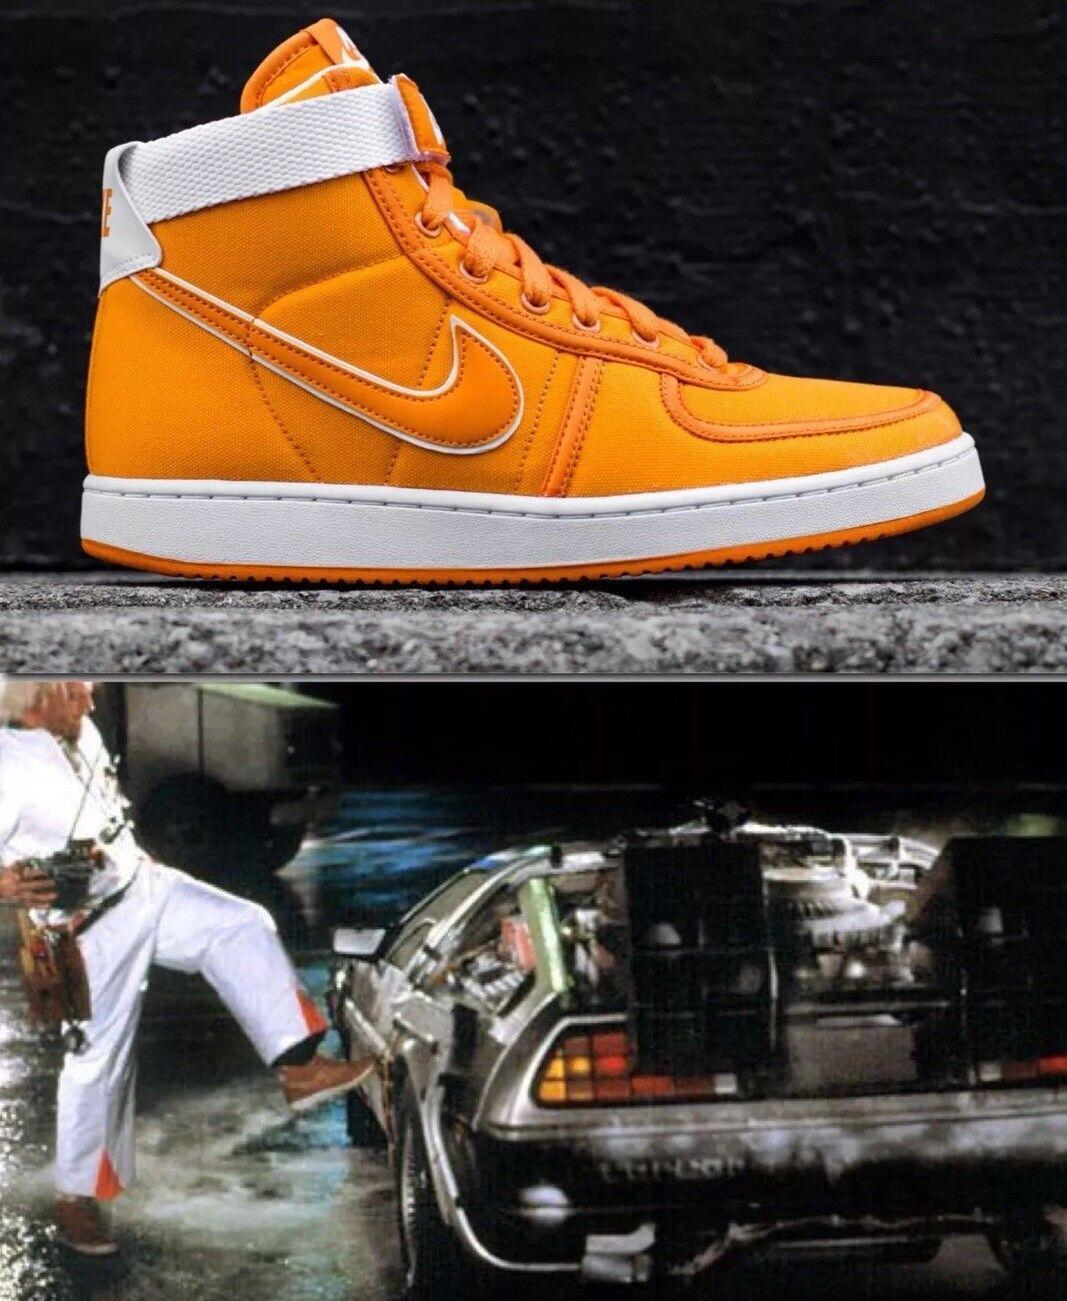 Nike Vandal High Supreme CNVS QS 'Doc braun' AH8605-800 AH8605-800 AH8605-800 UK 10 EU 45 US 11 New 26d507